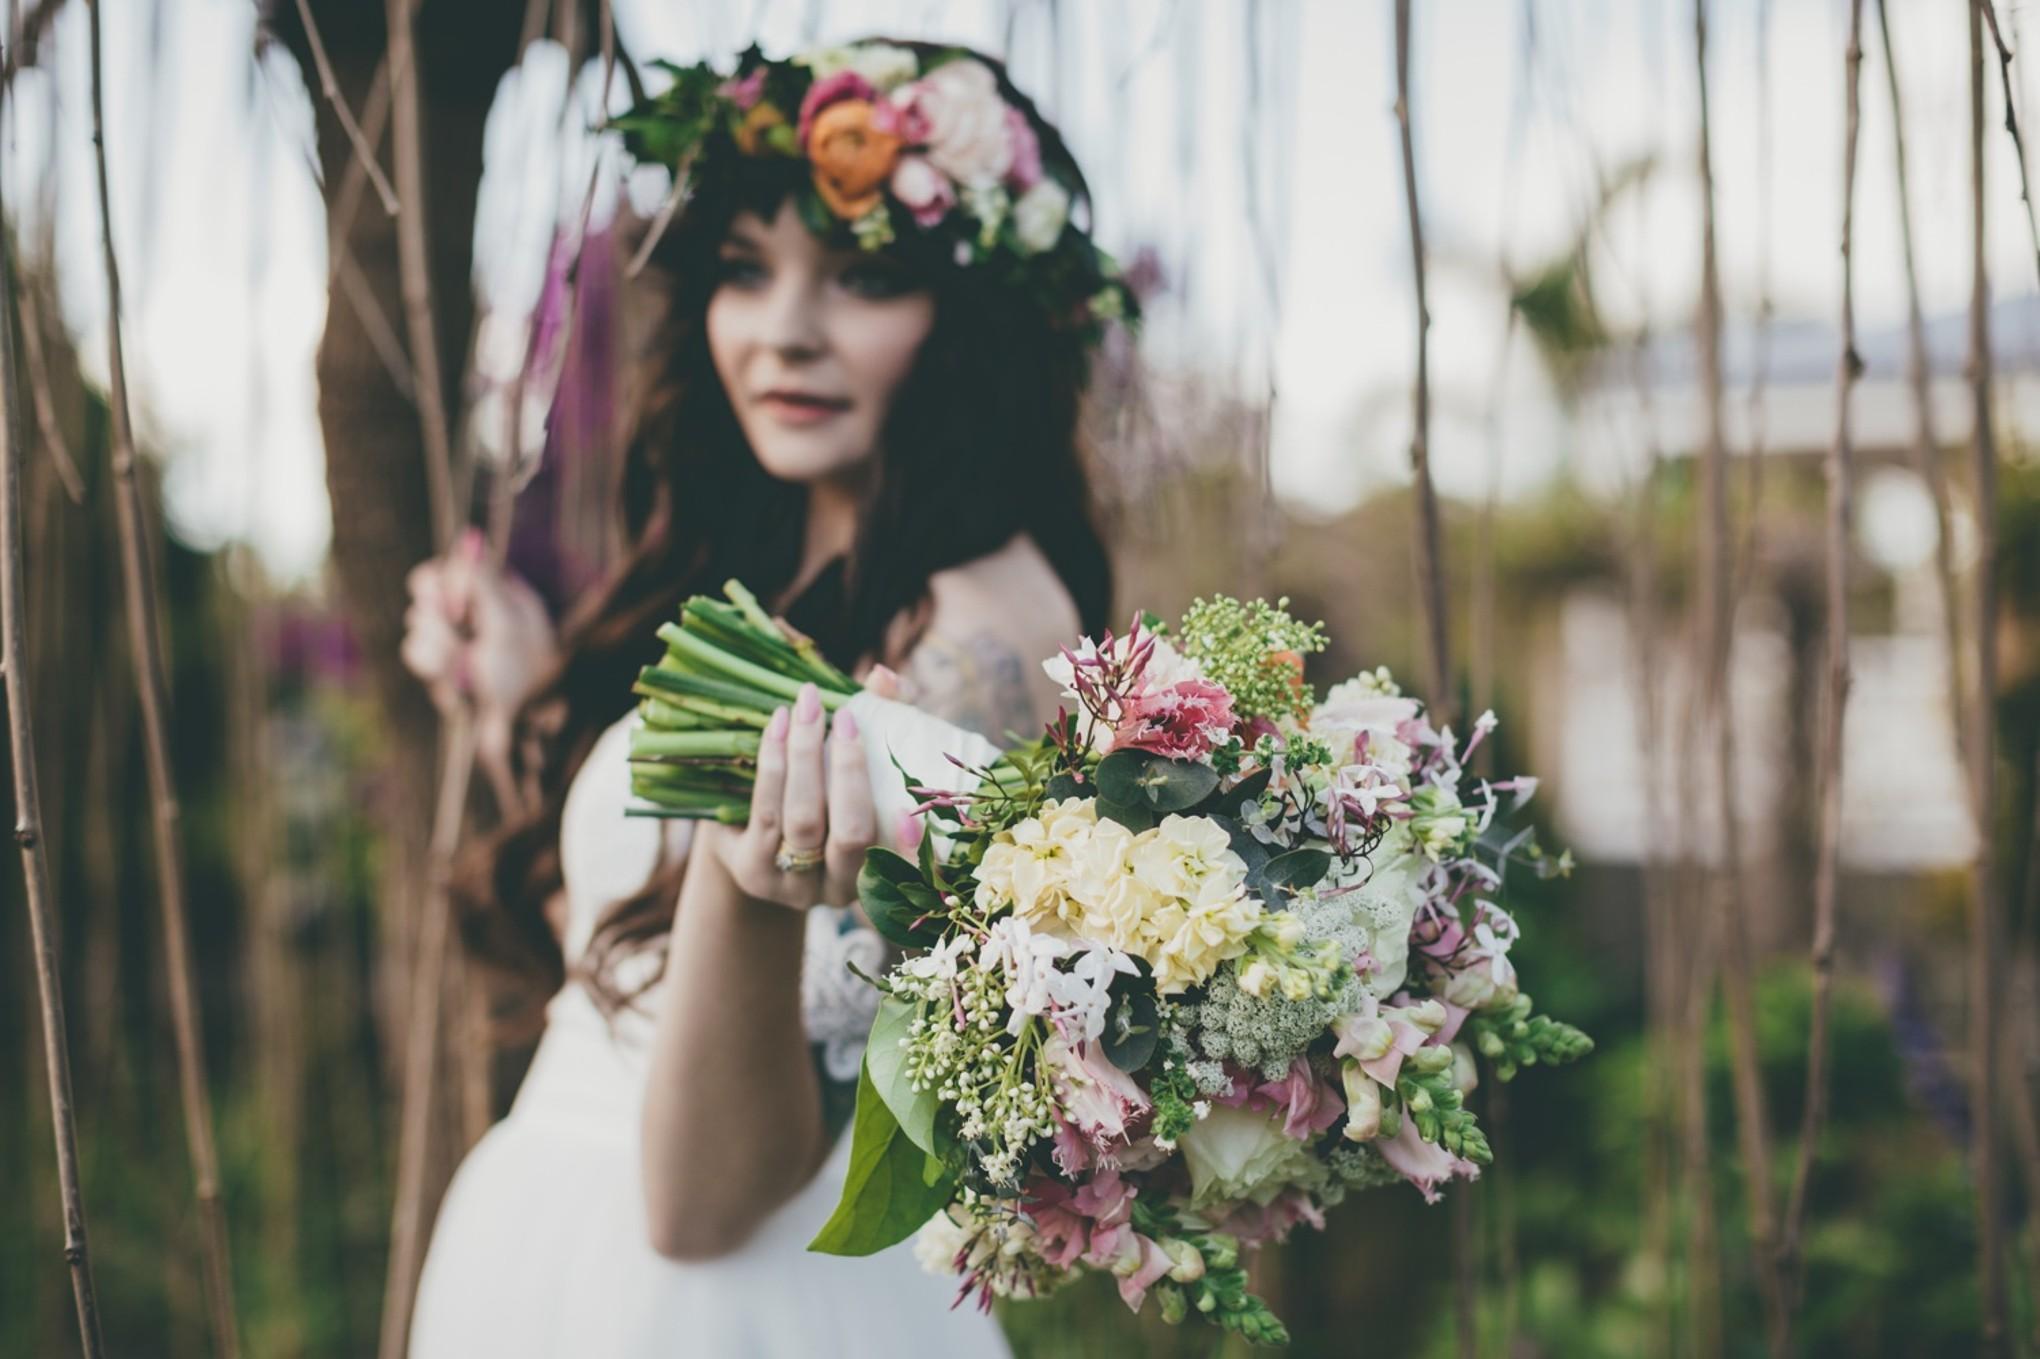 Romantic Garden Elopement at Mango Hill Farm - Bridestory Blog